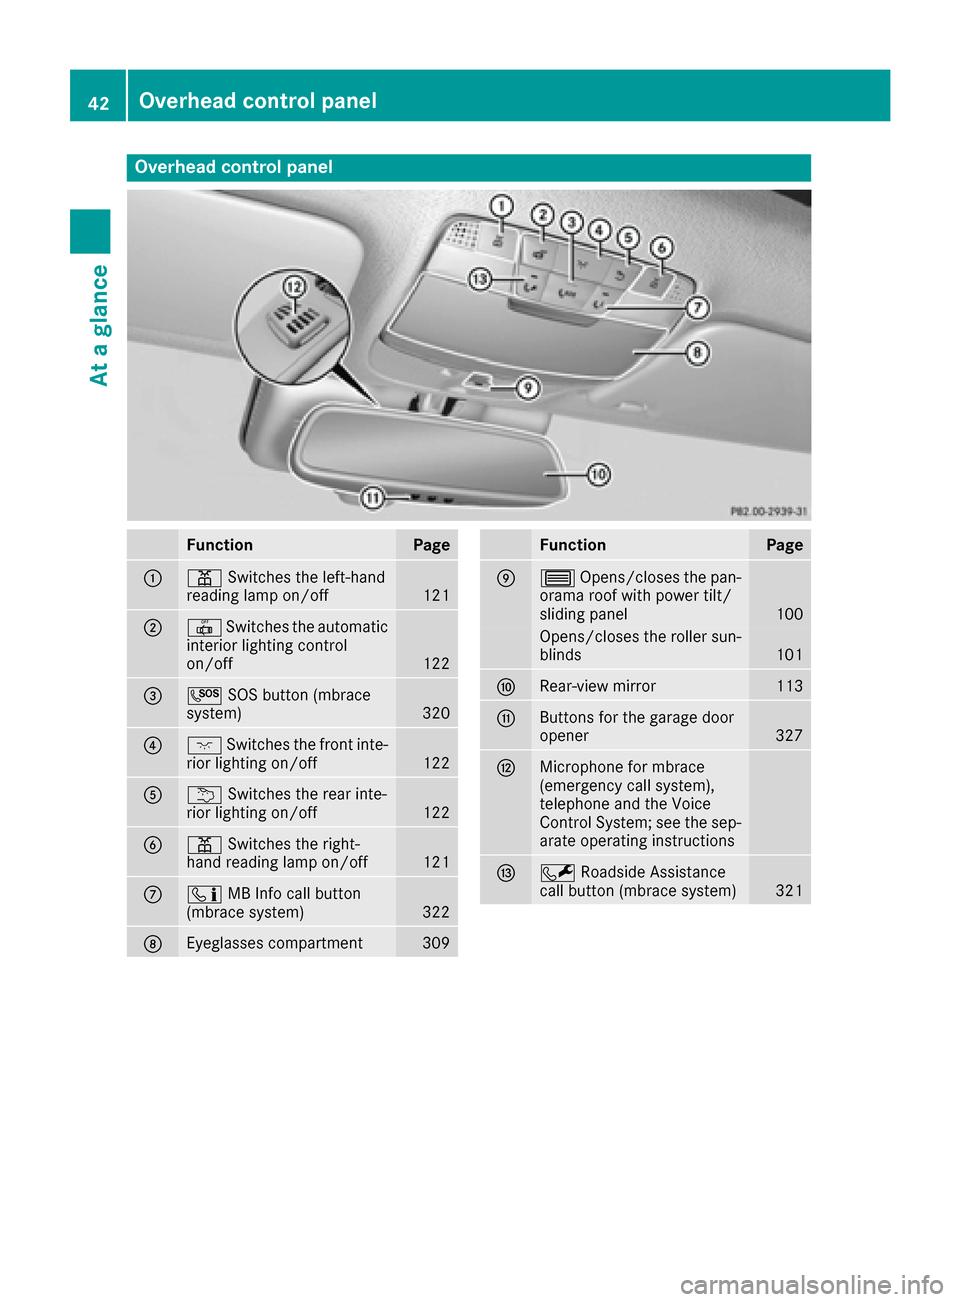 Mercedes Benz C Class Sedan 2016 W205 Service Manual